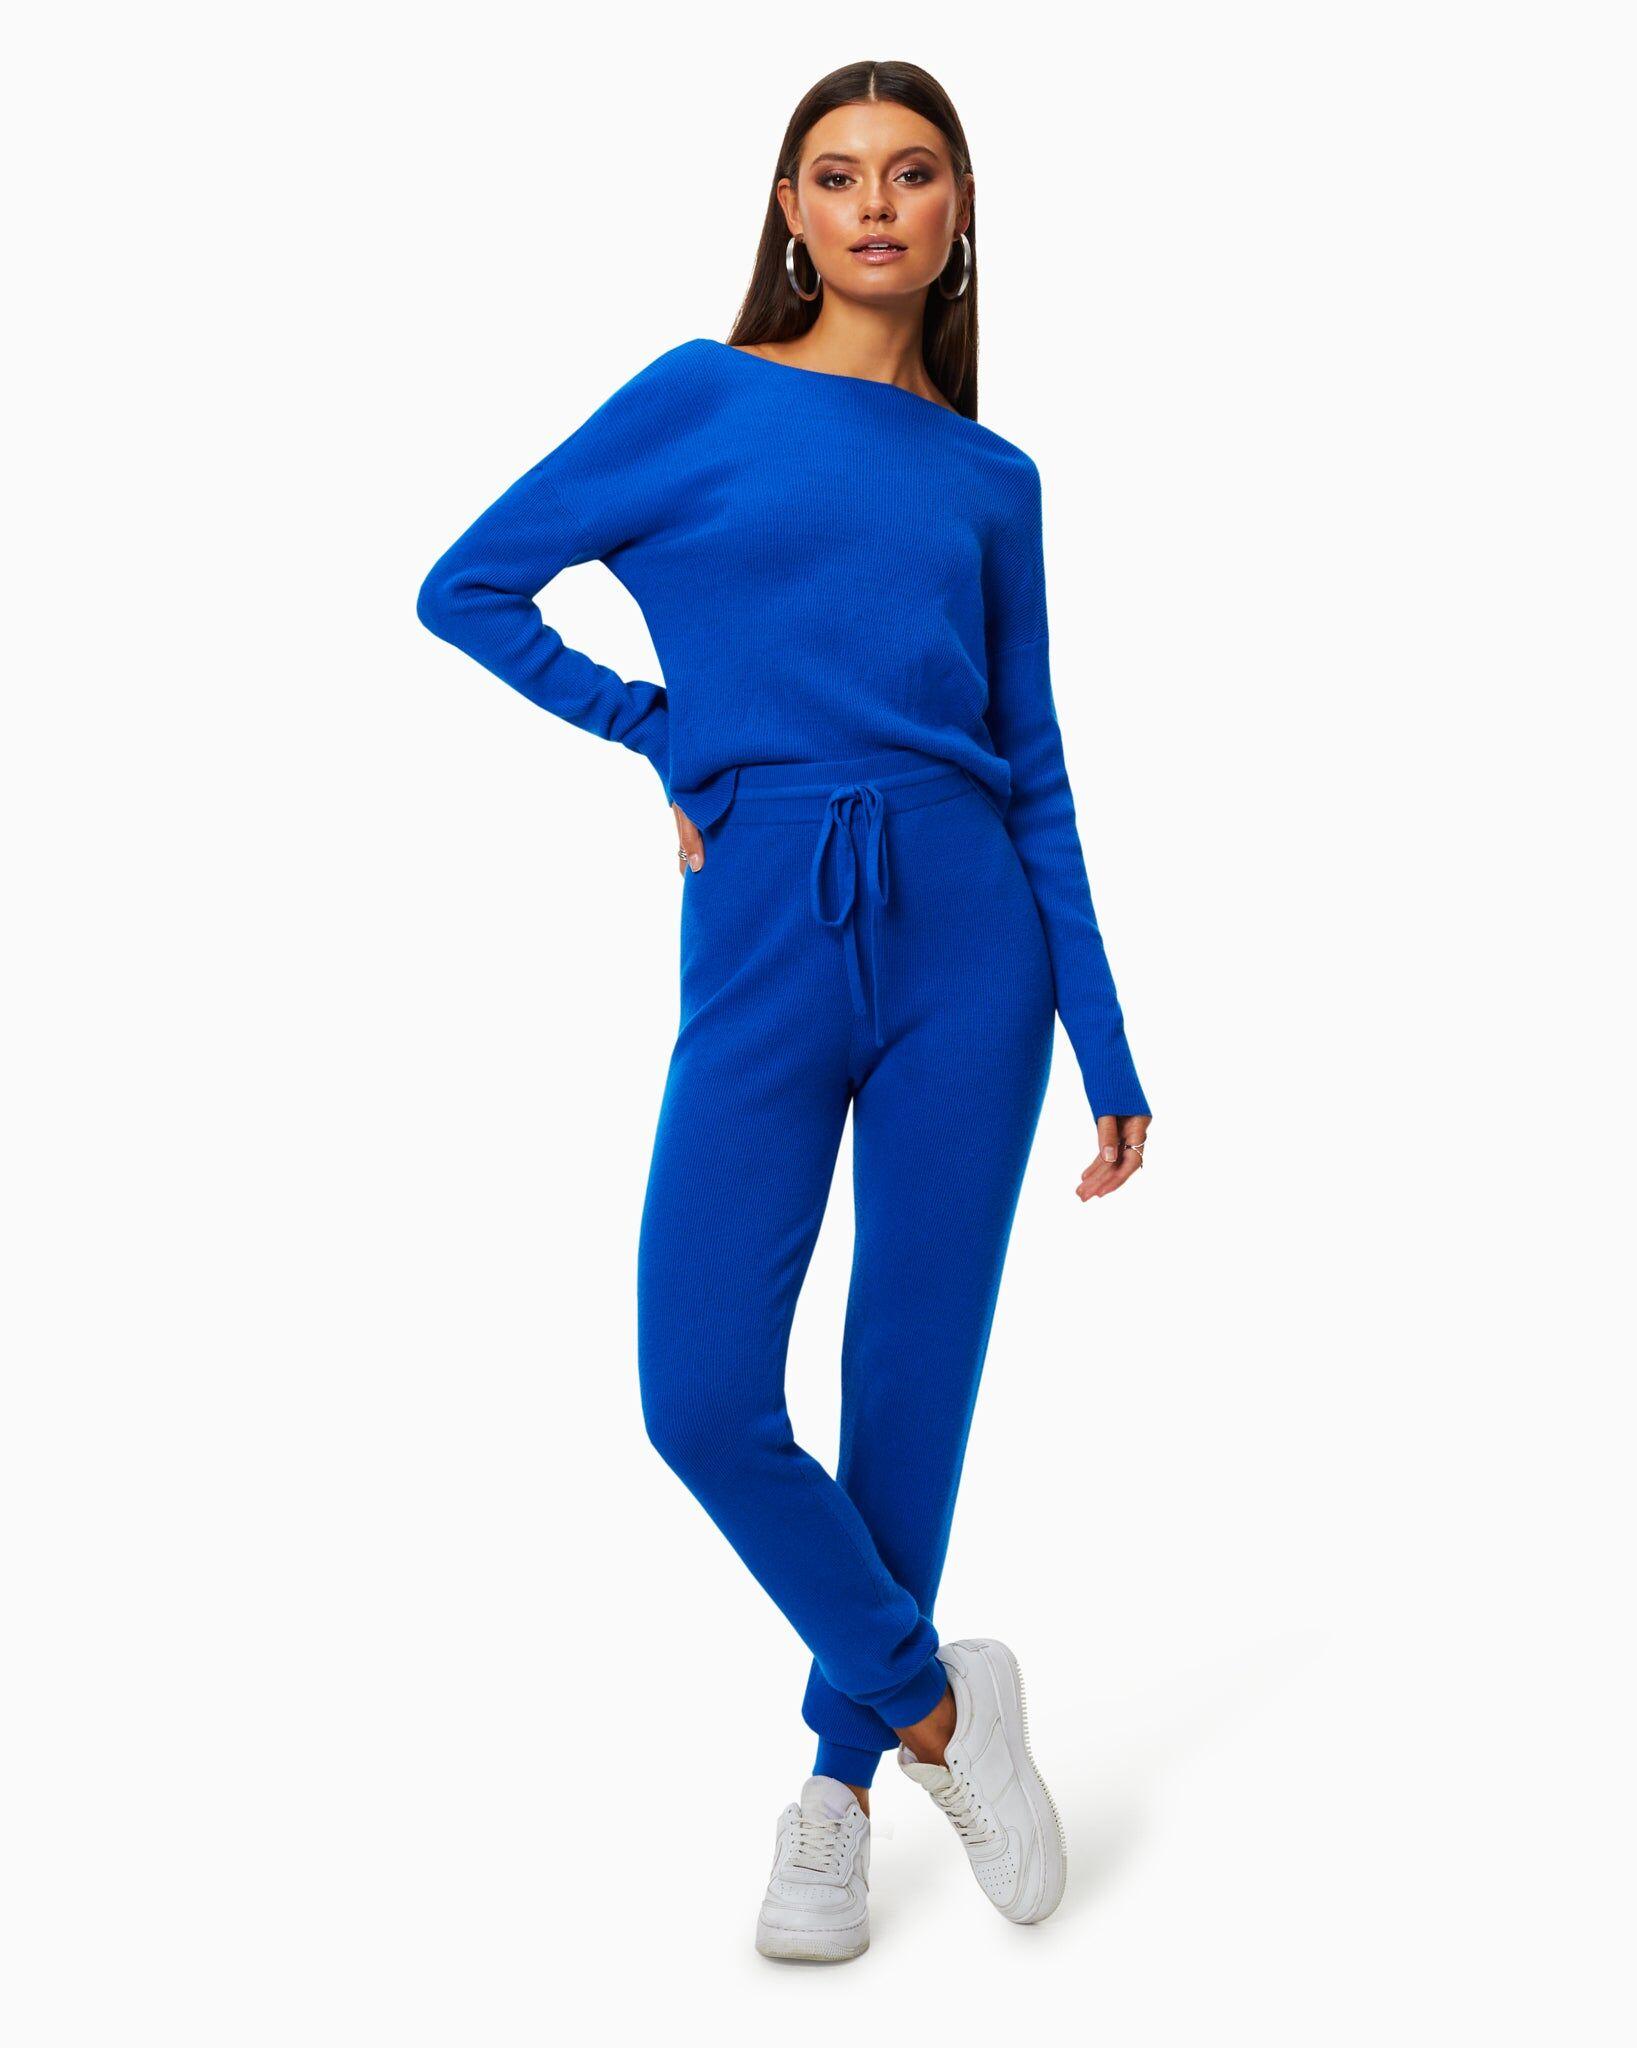 Landon Knit Jogger in Electric Blue - Electric Blue - Size: M